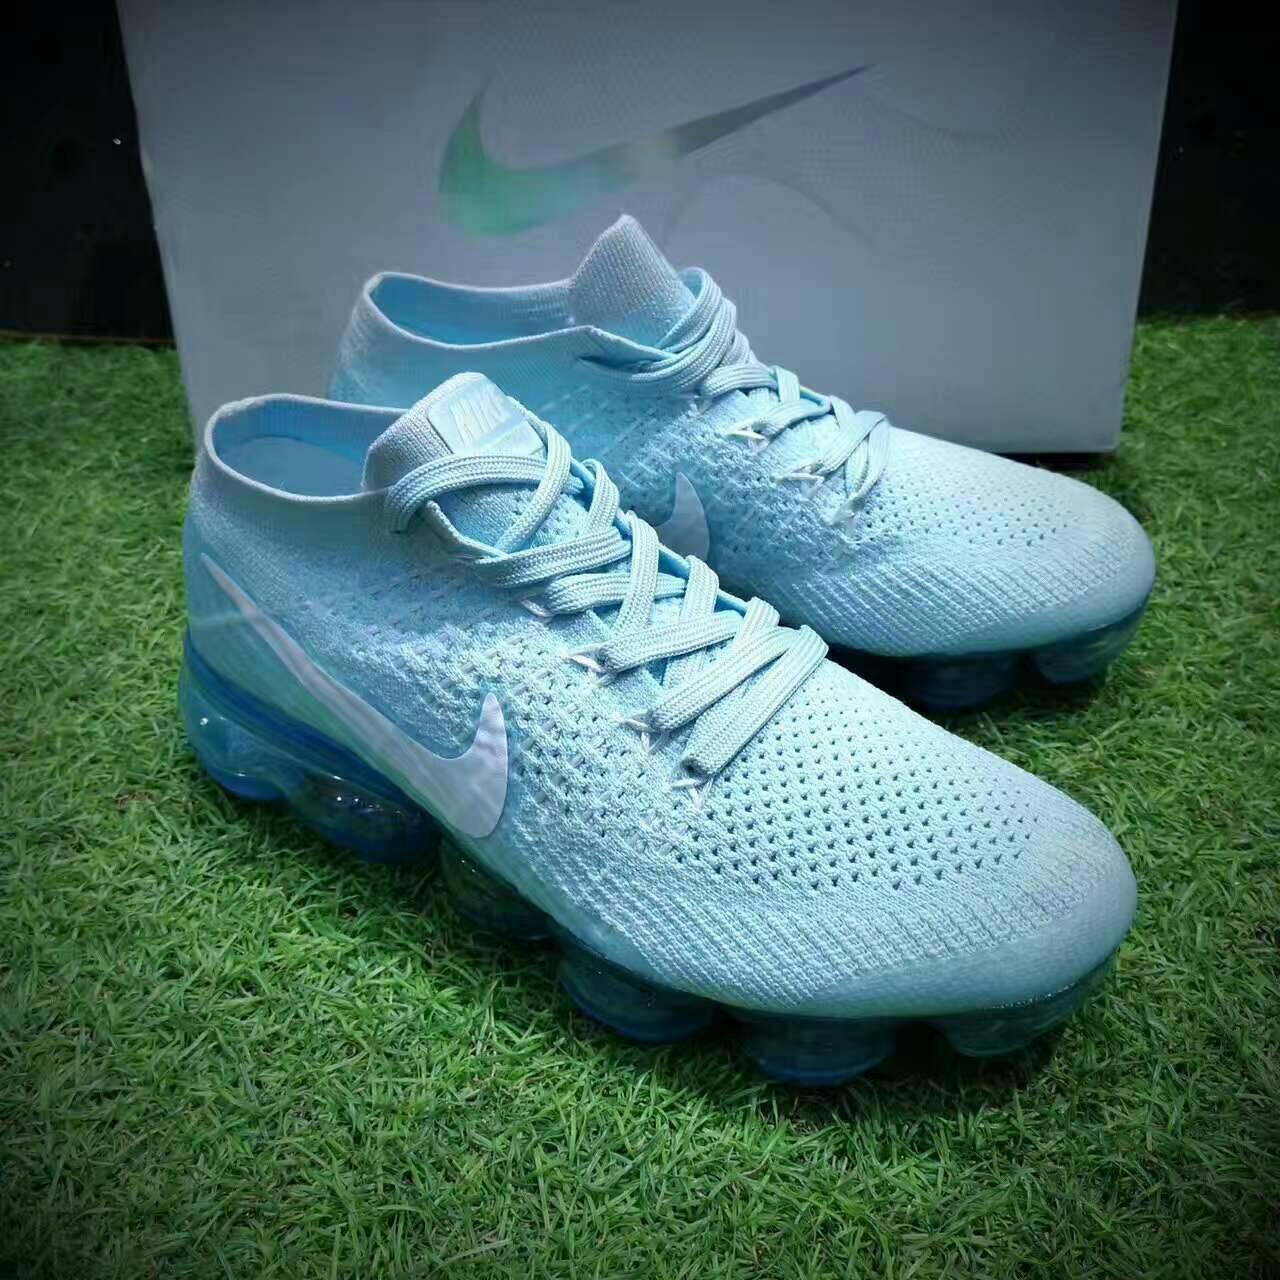 Nike Air Vapor Flyknit 2018 蒸汽大氣墊慢跑鞋「Glacier Blue」 情侶款